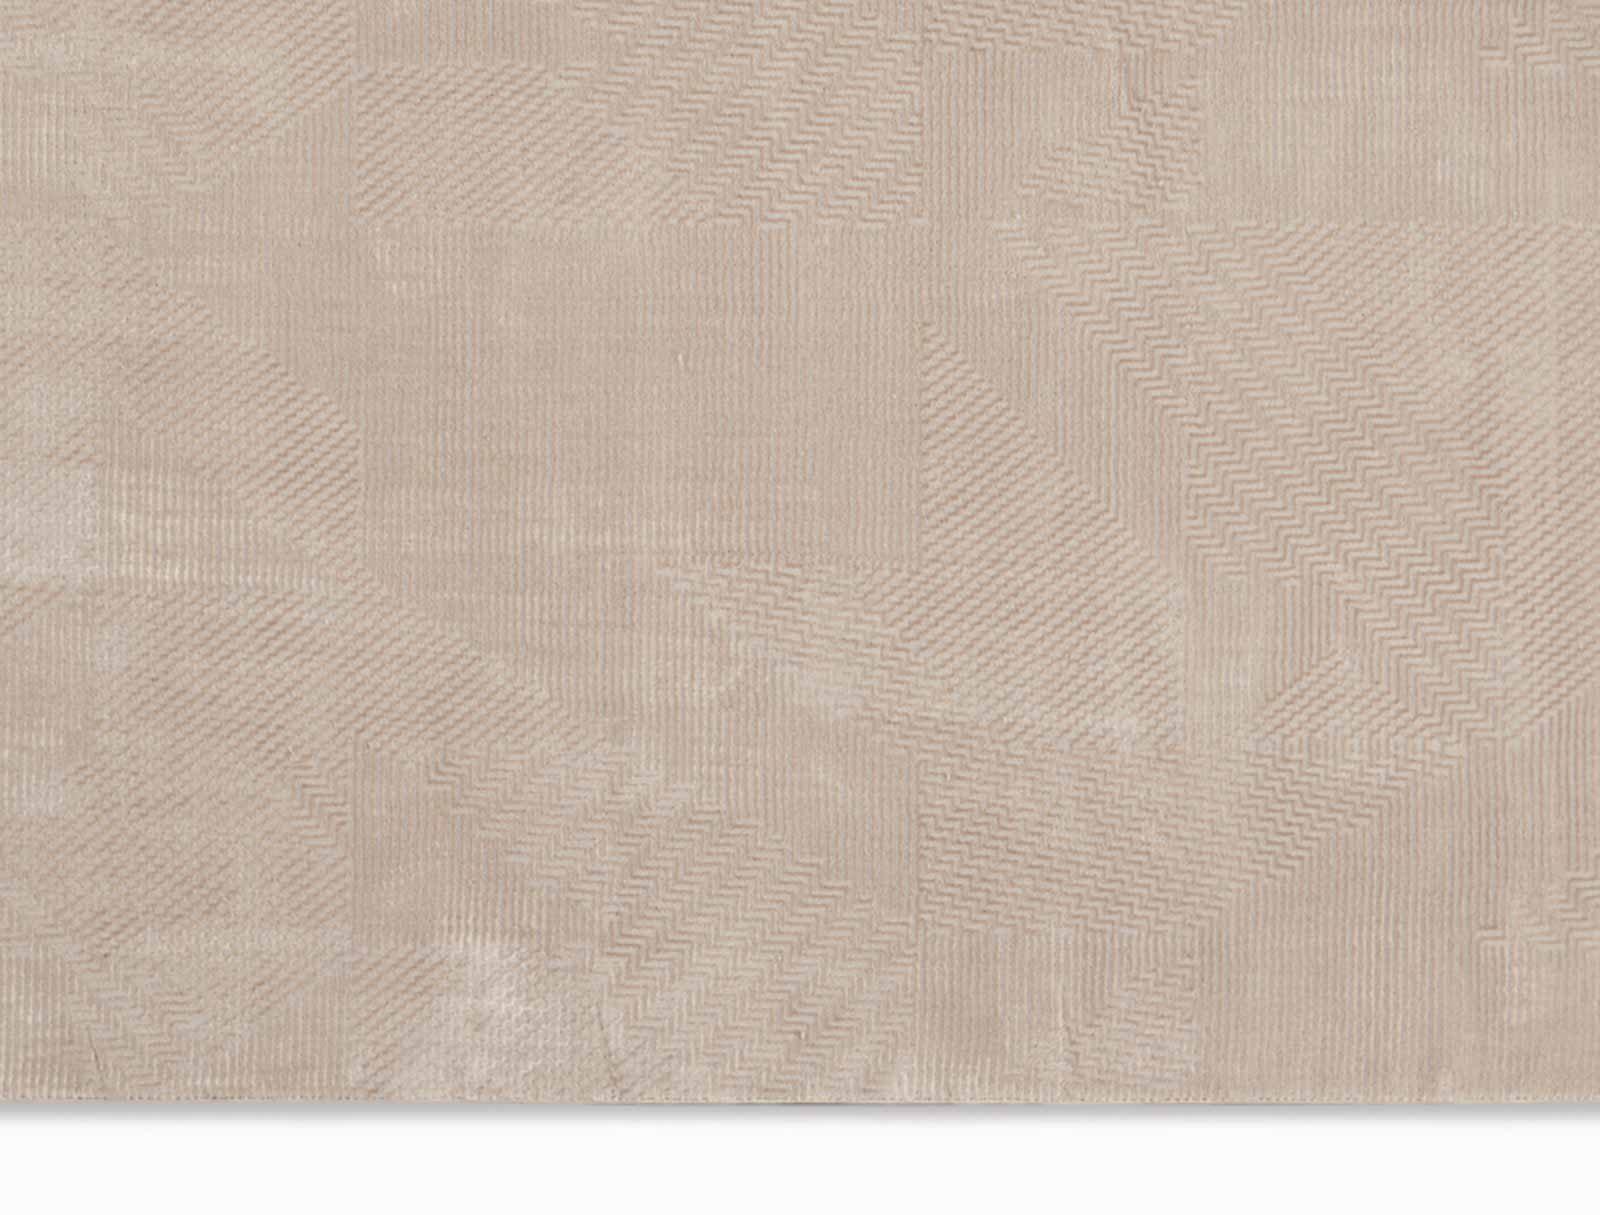 Calvin Klein rug Orlando CK850 CK852 GREY SAFFRON 5X7 099446488091 alt2